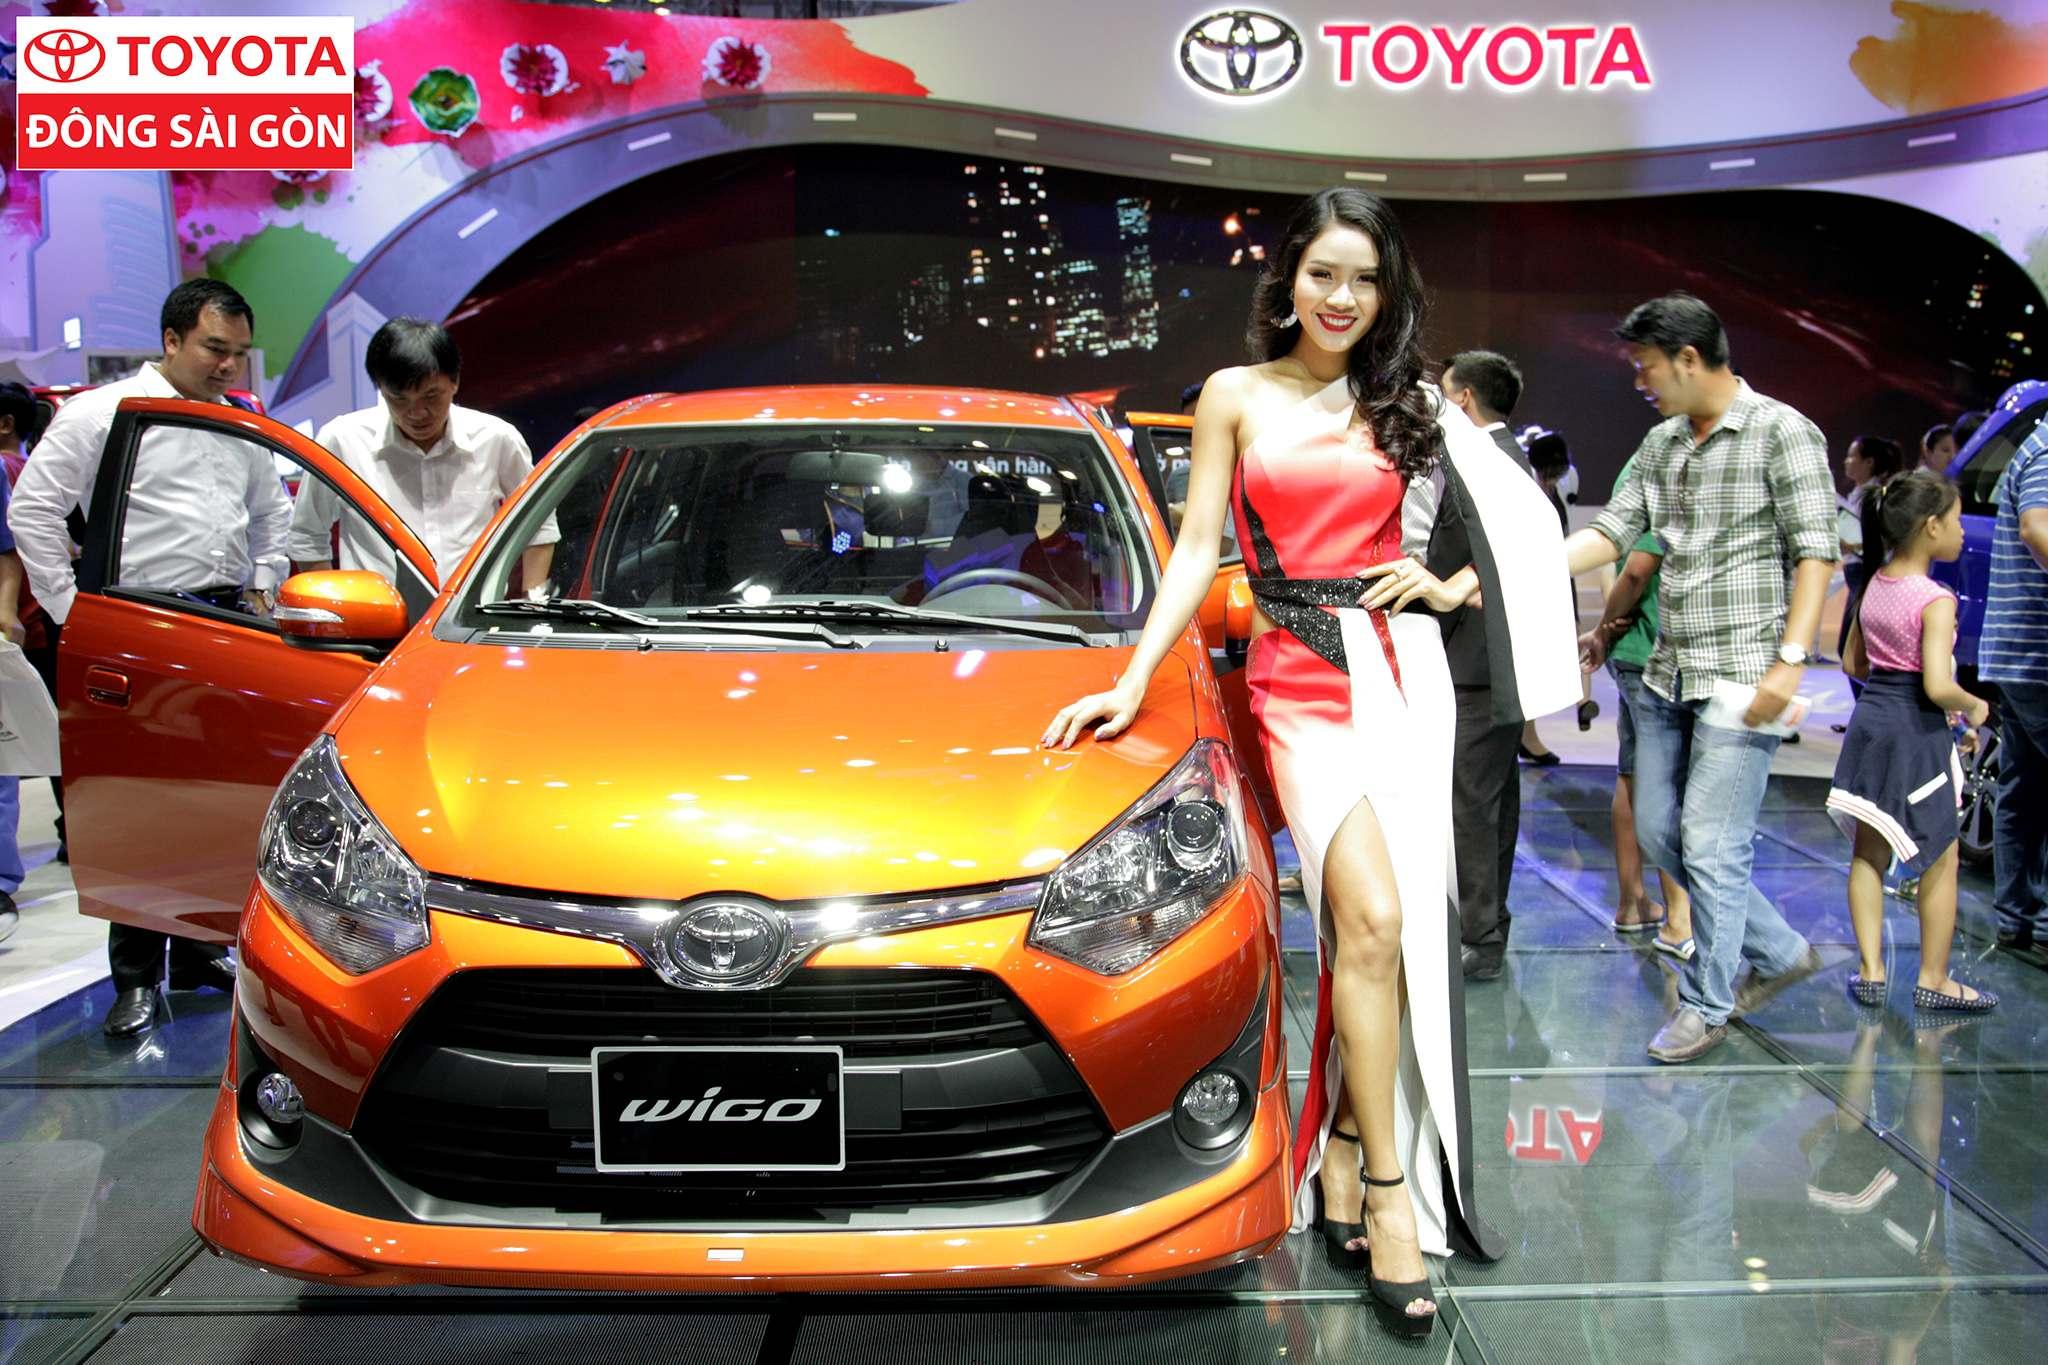 vietnam motor show 20172 Toyota at Vietnam Motor Show 2017